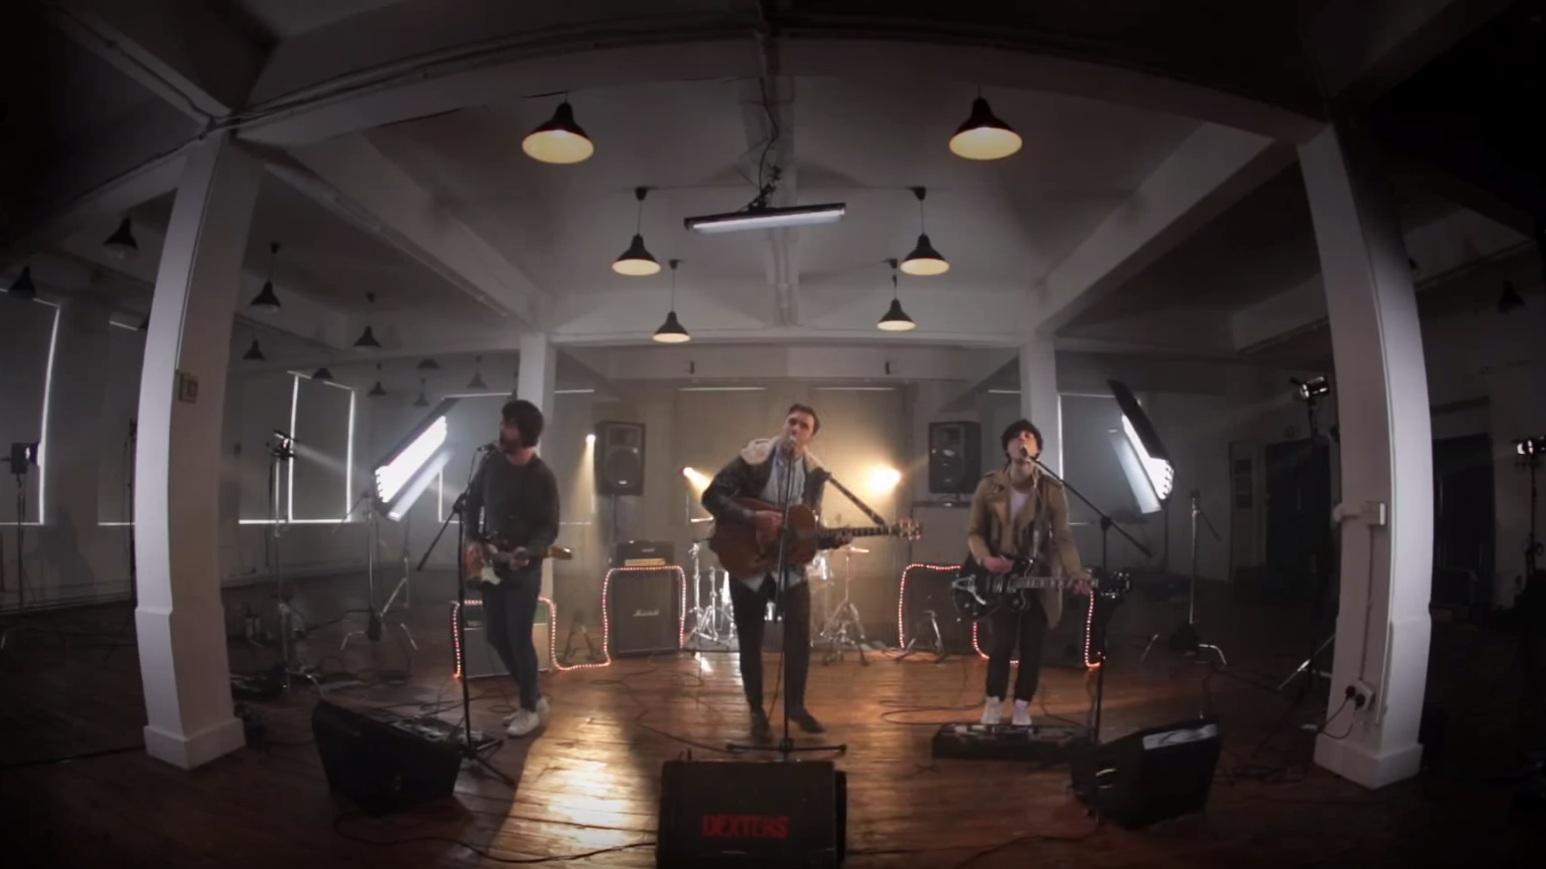 DEXTERS - MUSIC VIDEO